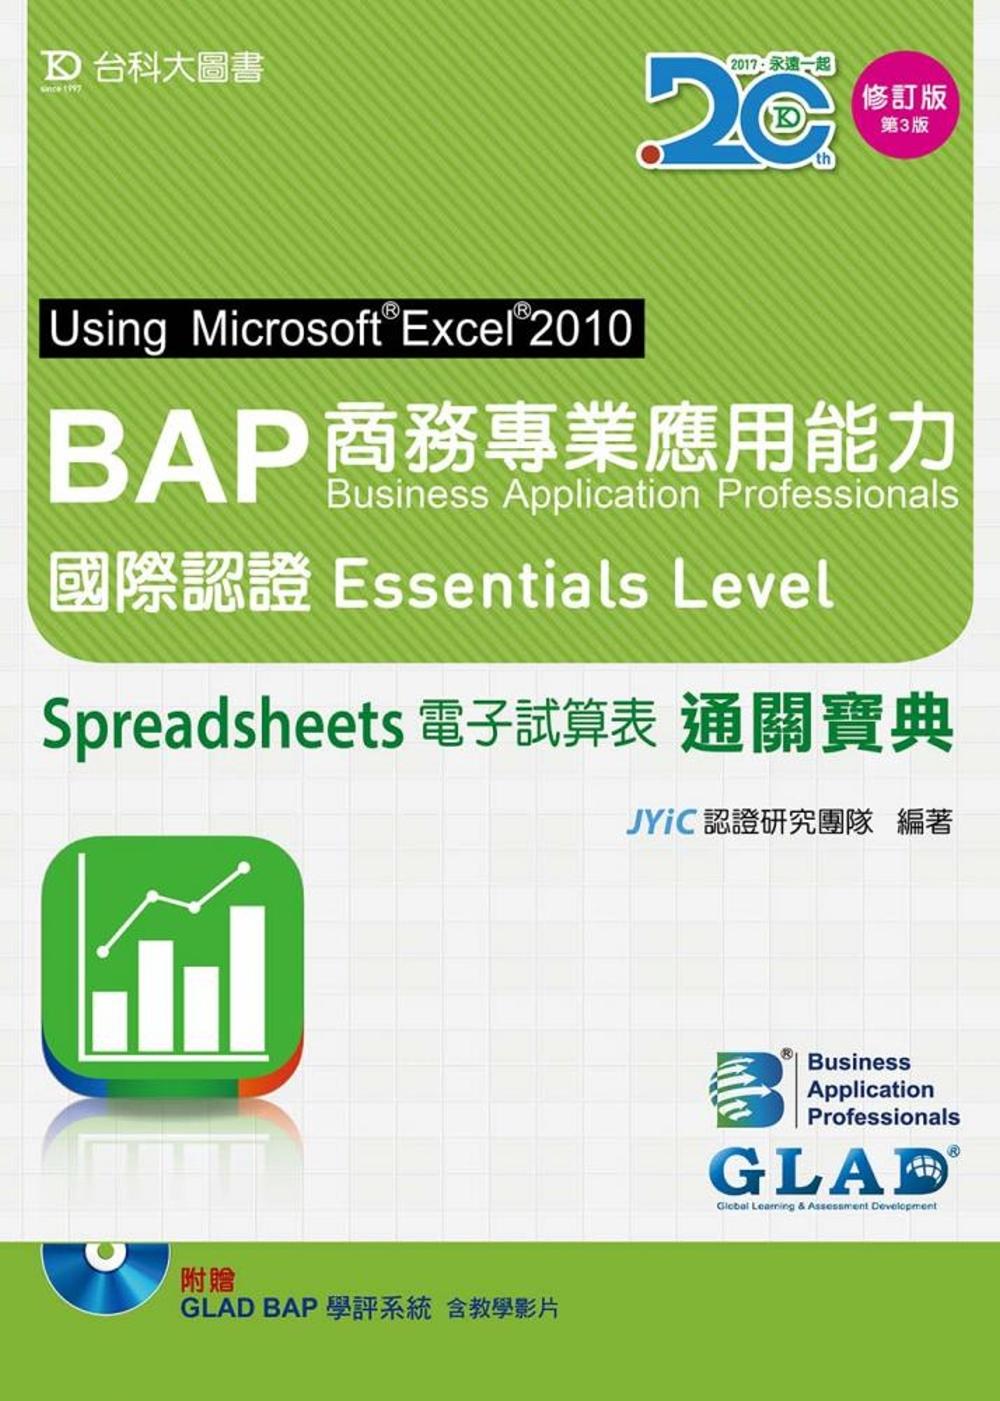 BAP Spreadsheets電子試算表Using Microsoft Excel 2010商務專業應用能力國際認證Essentials Level通關寶典 - 增訂版(第三版) - 附贈BAP學評系統含教學影片